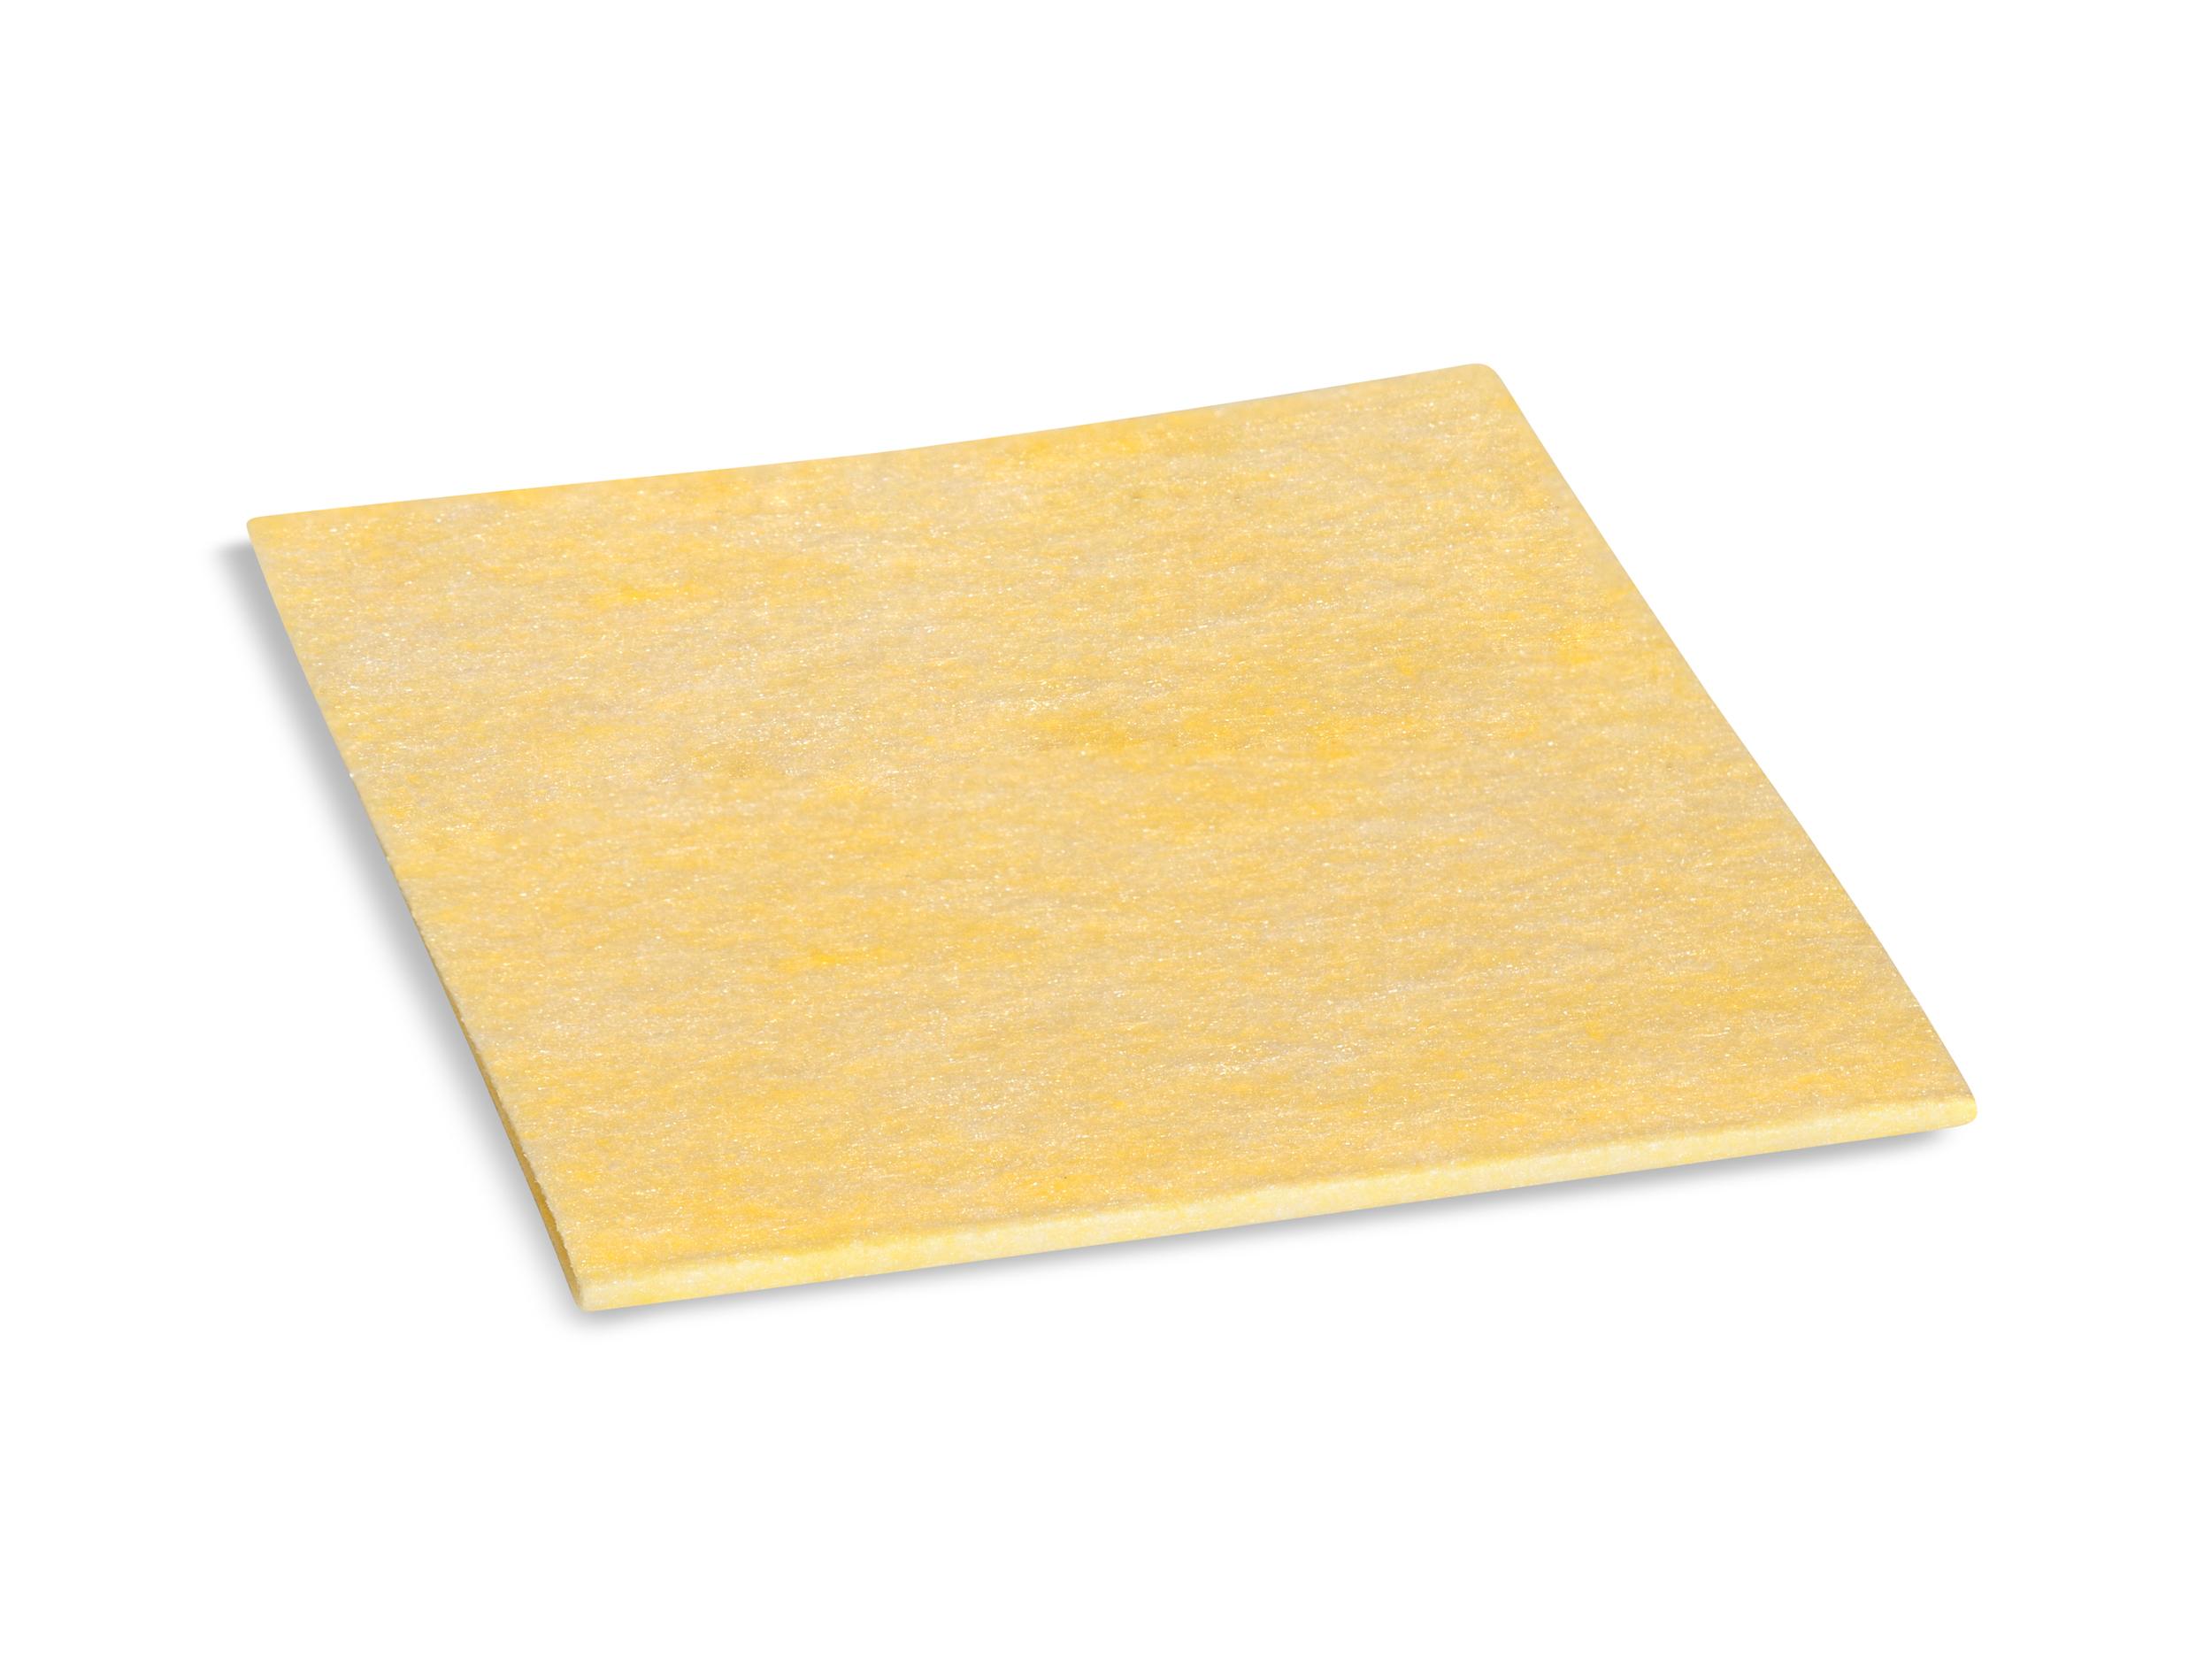 Rychloutěrka 32x38cm 85g žlutá MT708407